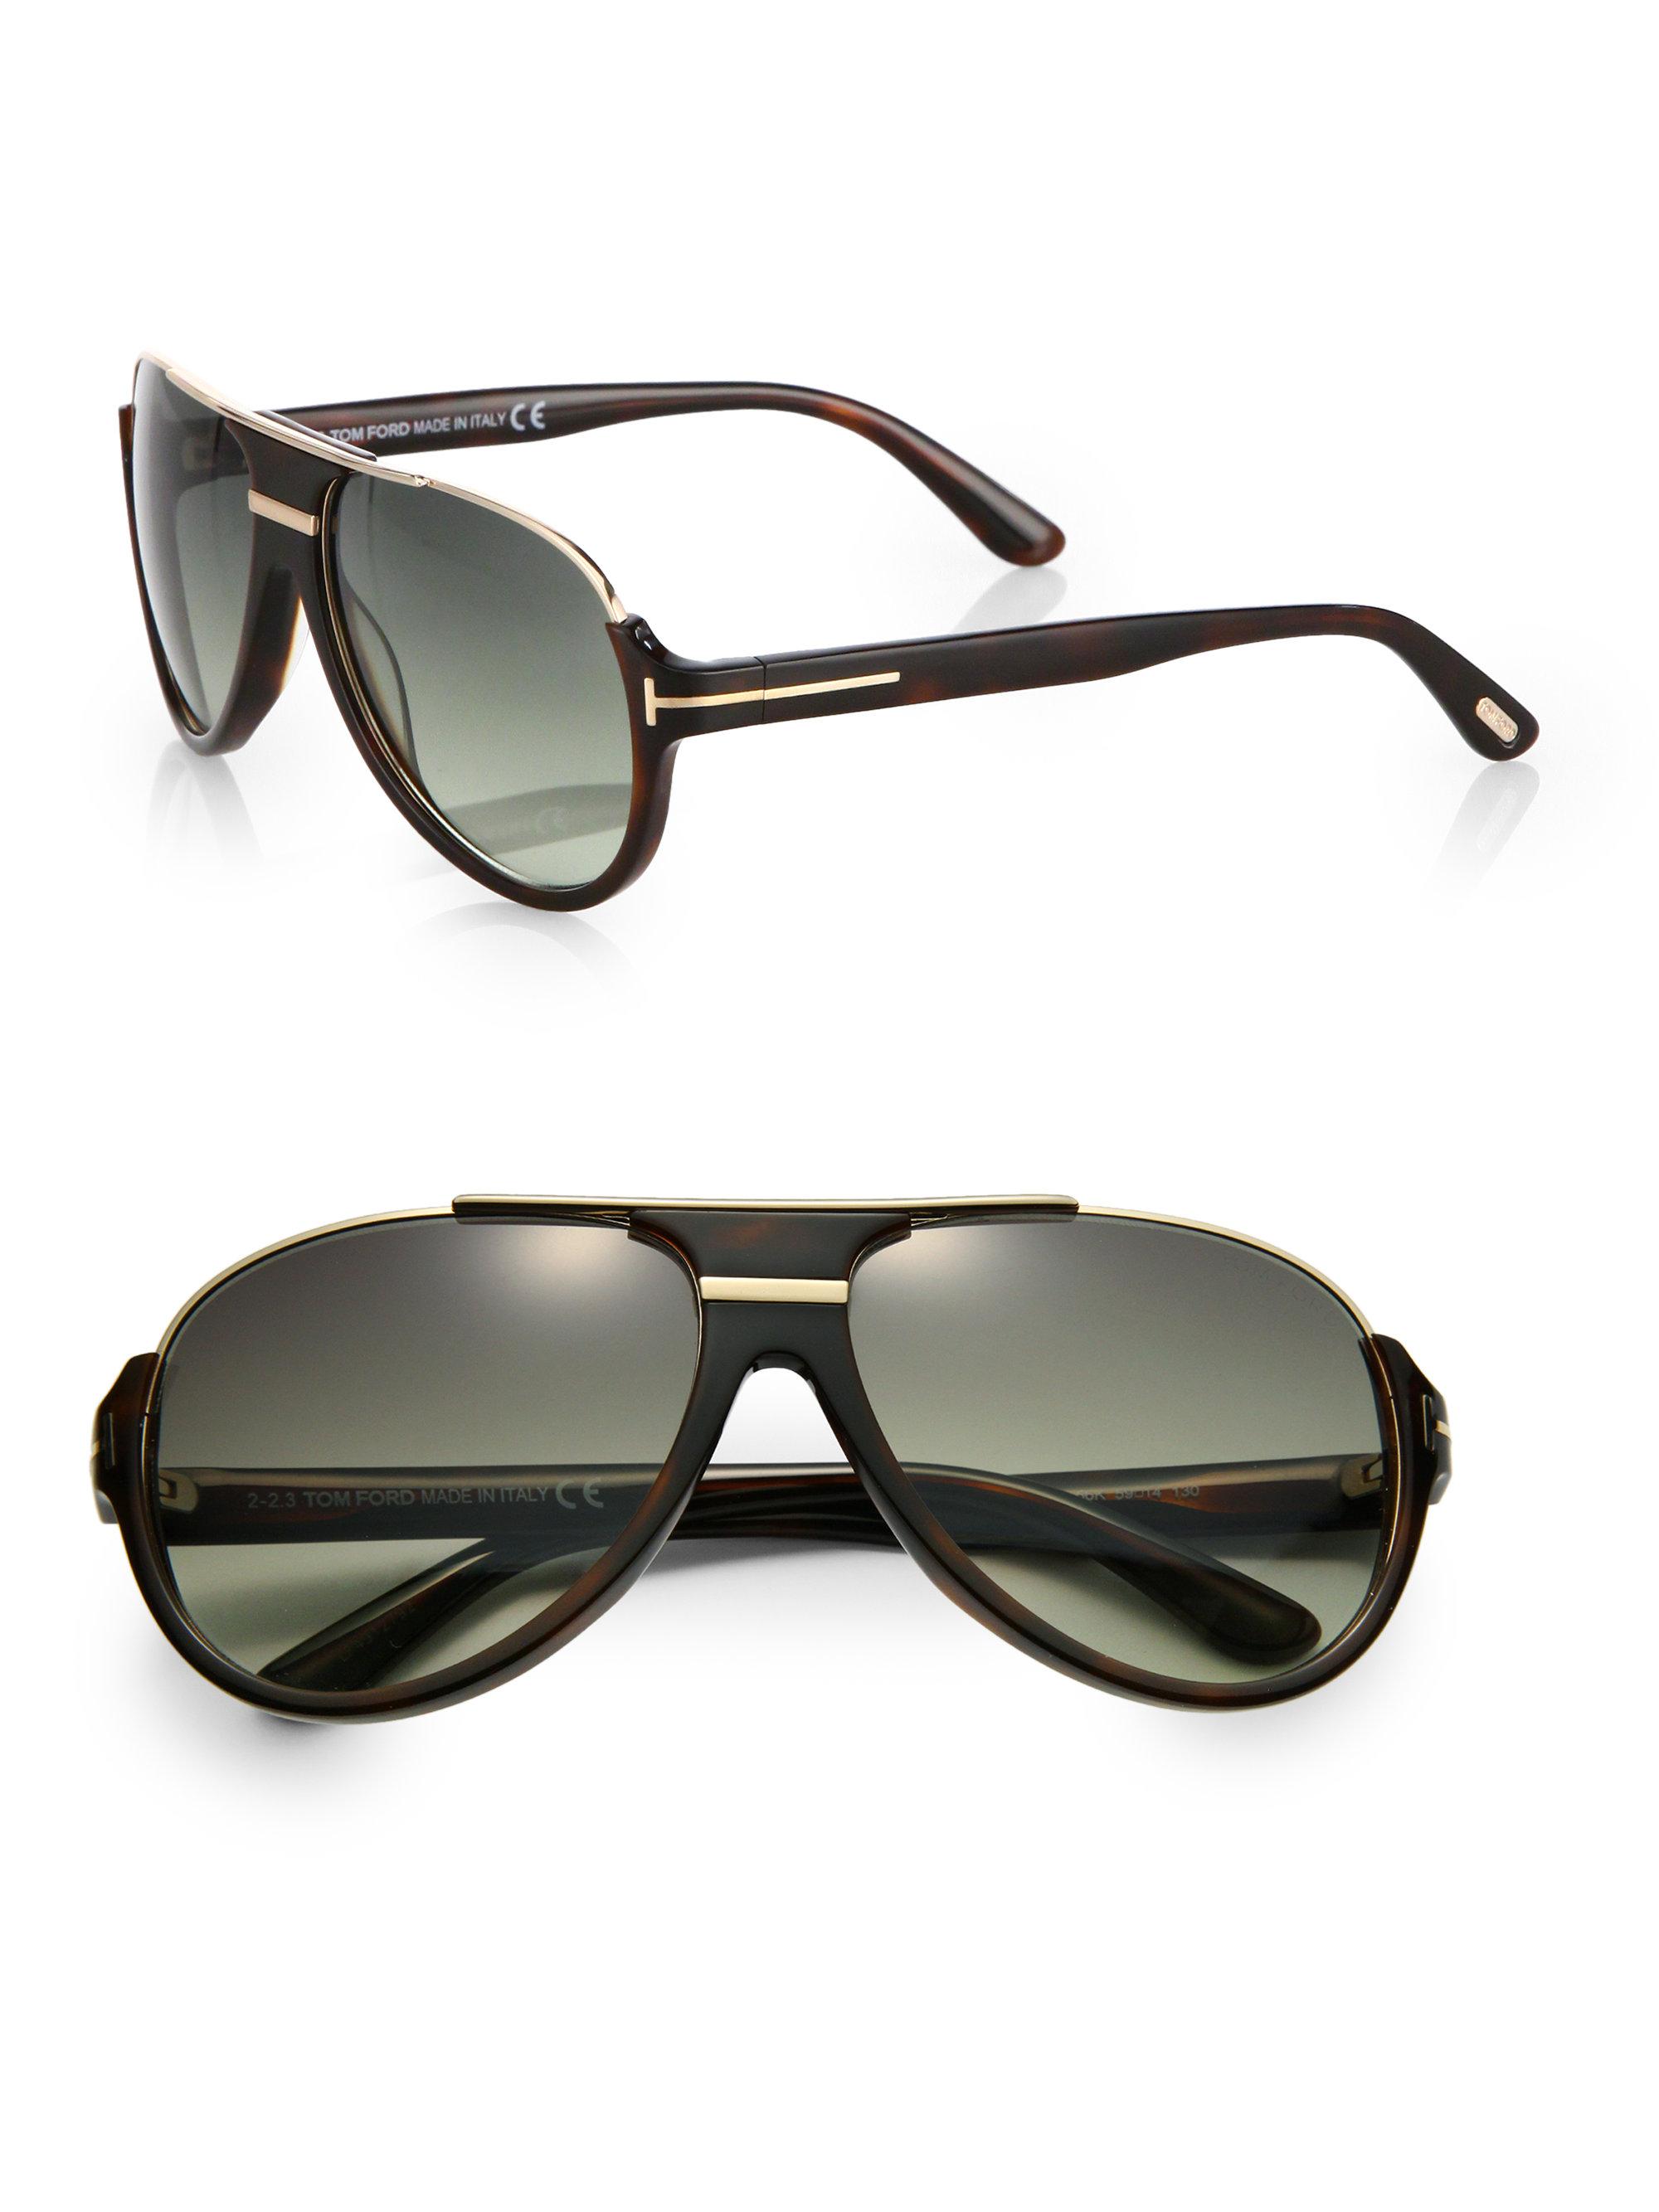 4609c67833 Tom Ford Sunglasses Mens Aviators